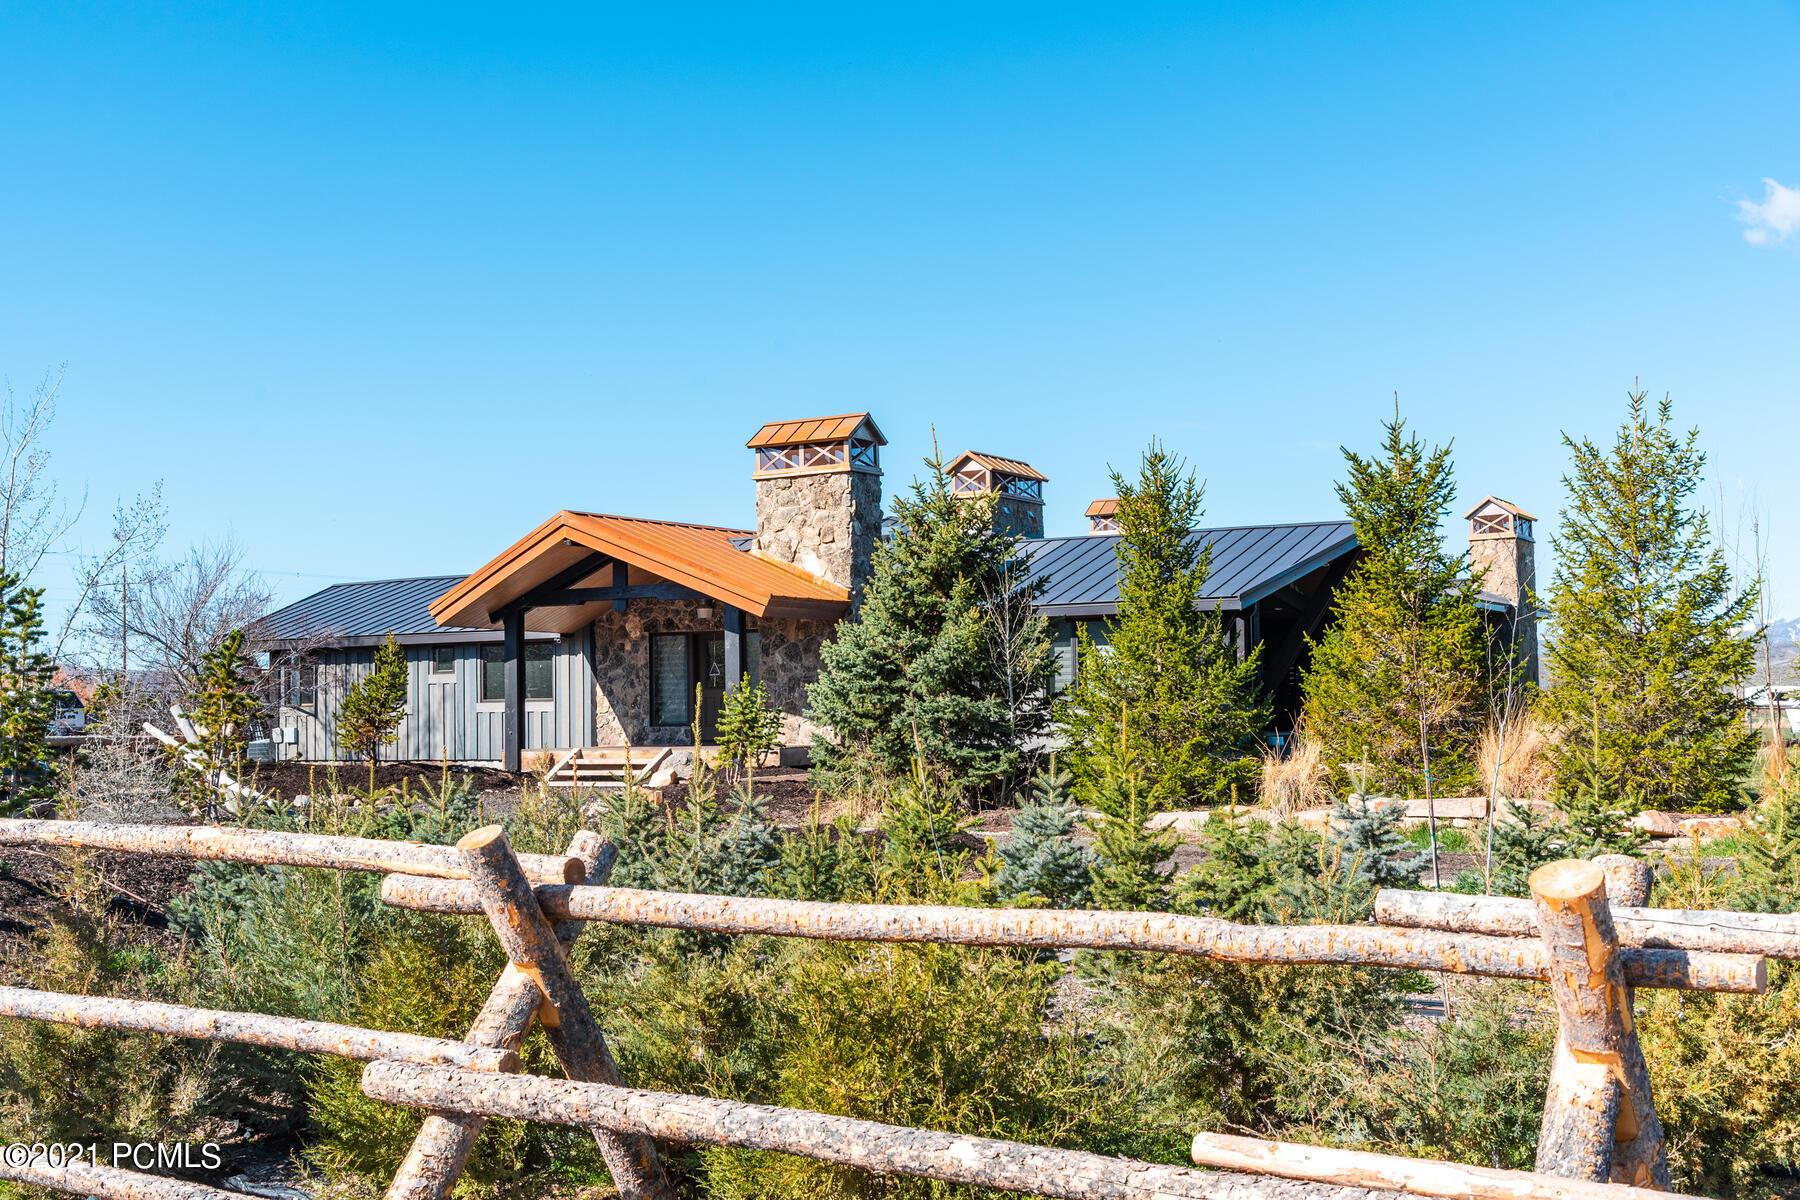 250 Simpson Lane, Kamas, Utah 84036, 4 Bedrooms Bedrooms, ,4 BathroomsBathrooms,Single Family,For Sale,Simpson,12101836